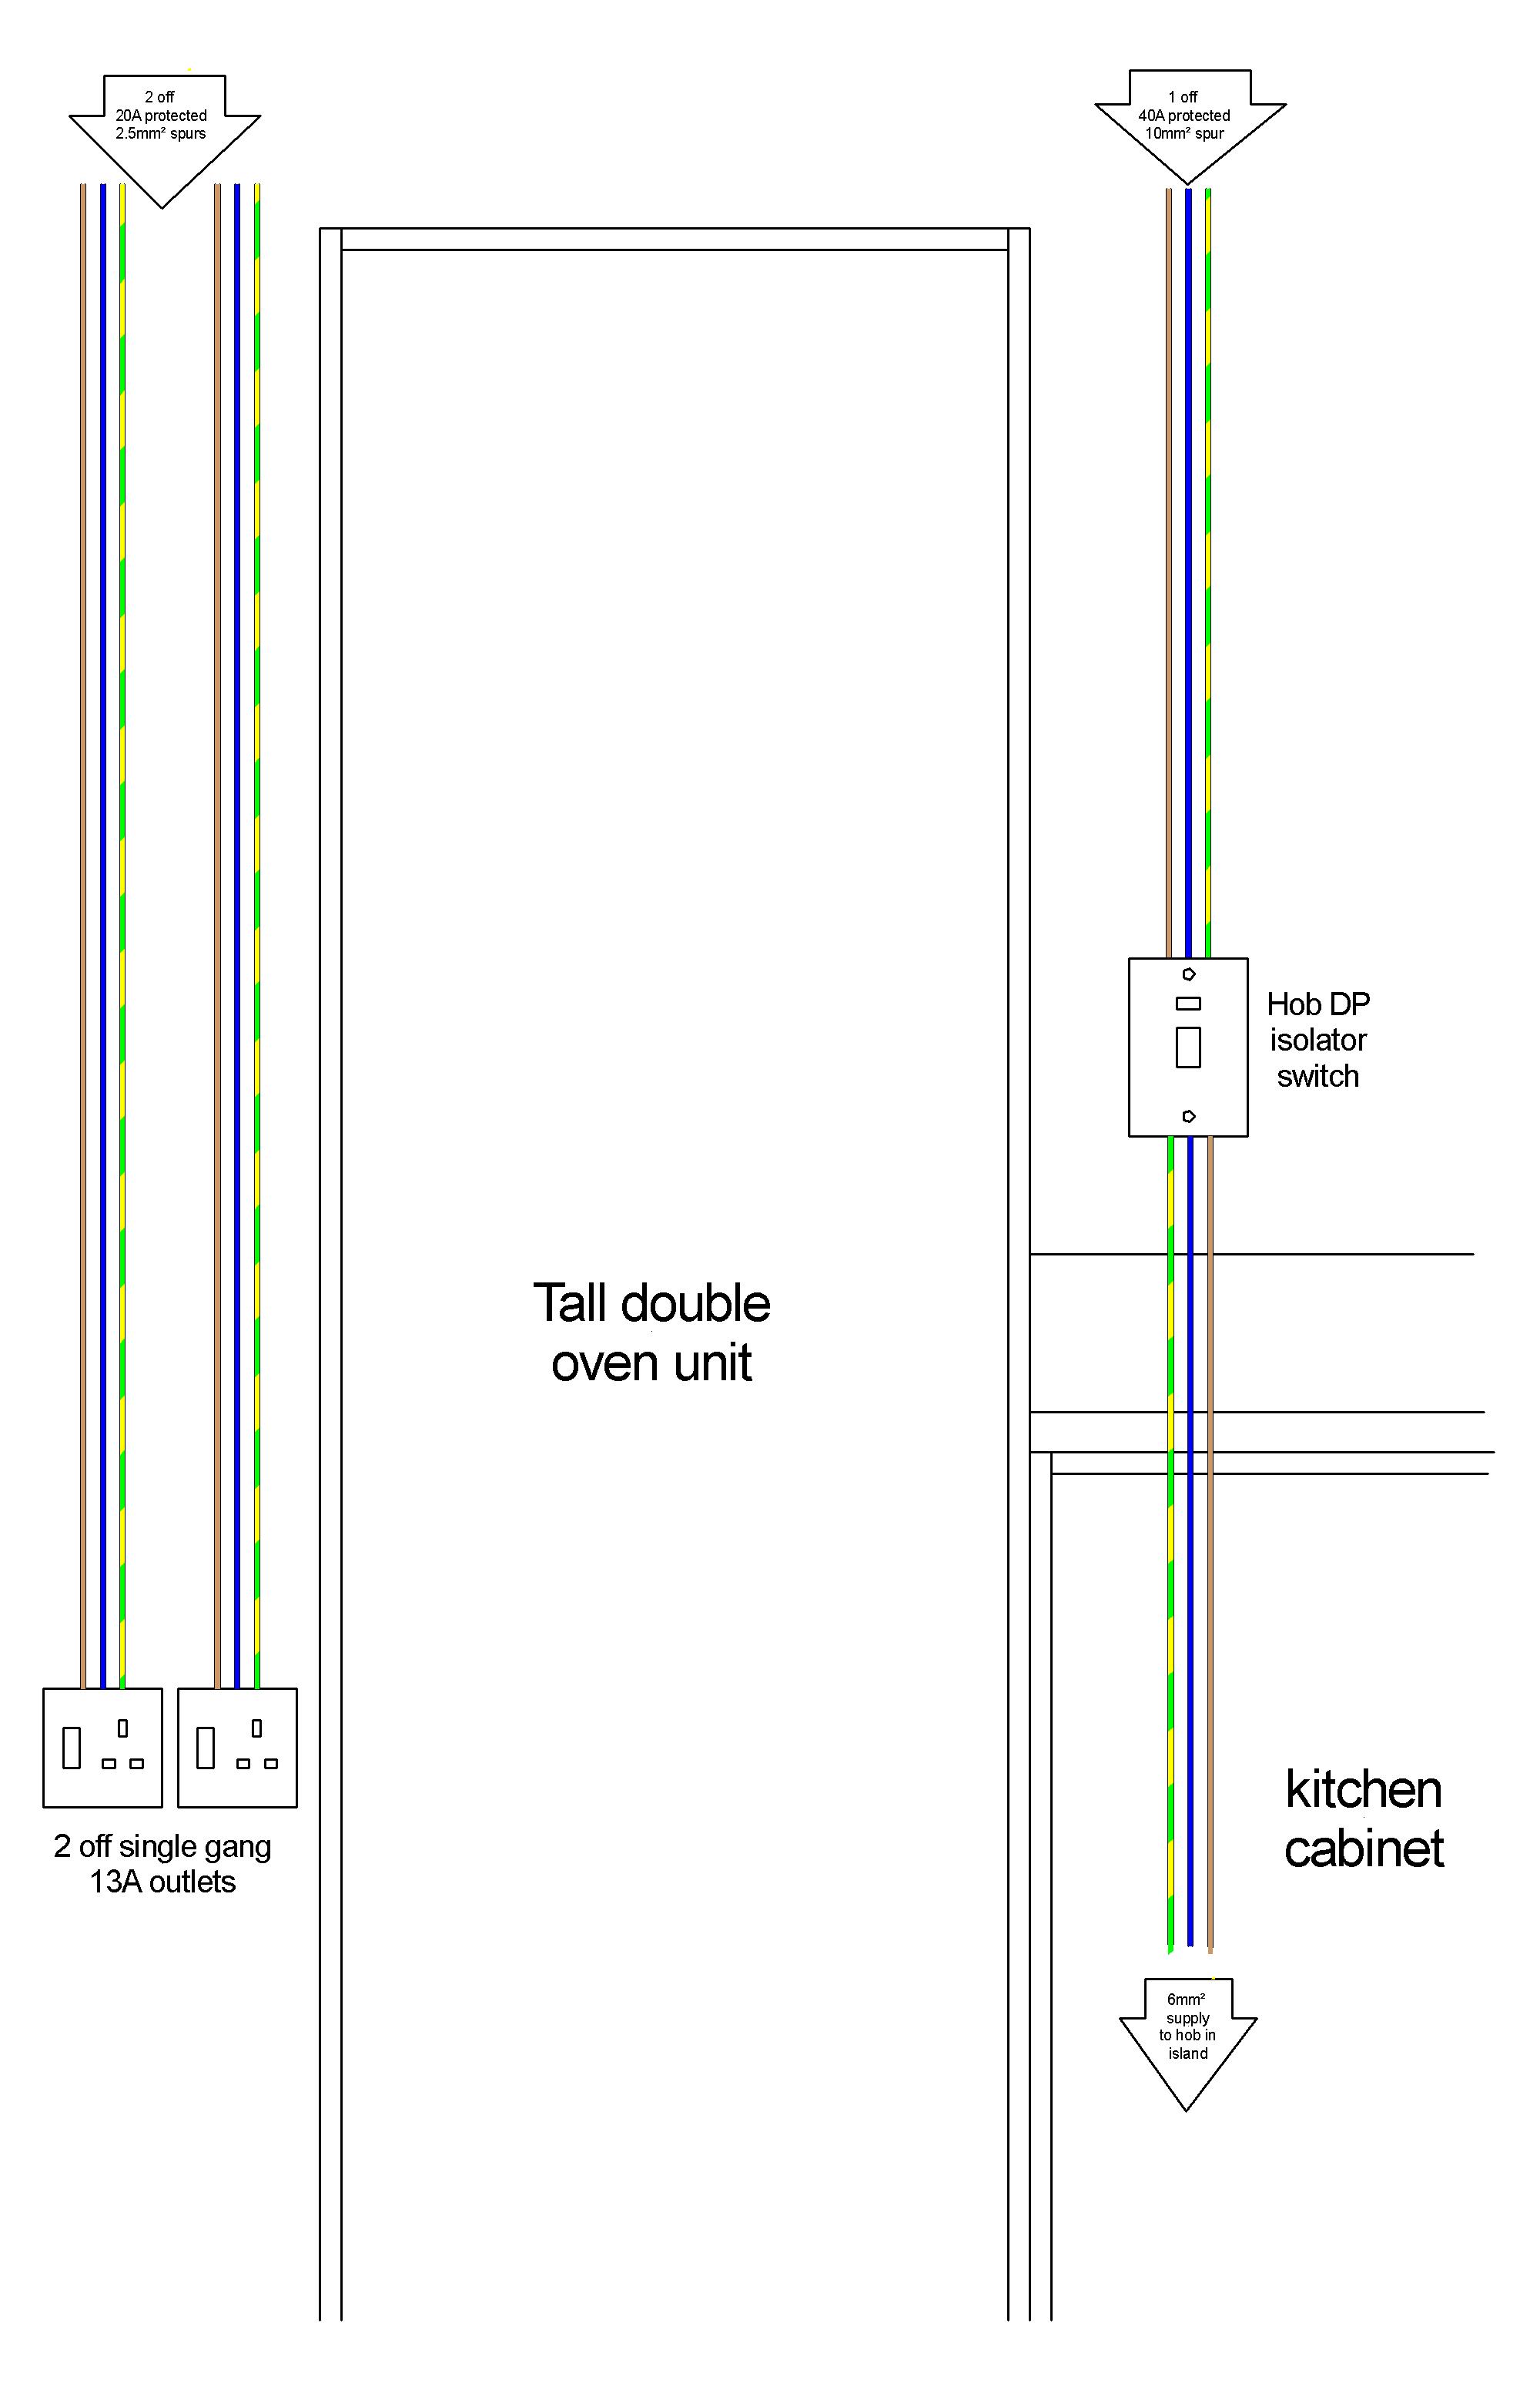 Isolation Switches Page 2 Electrics Kitchen Bathroom Wiring Regulations Cooker Switch 589dbddf0fbf9 Originalkitchenappliancewiringthumbe7929fcf215df20c9581d341b5c66130